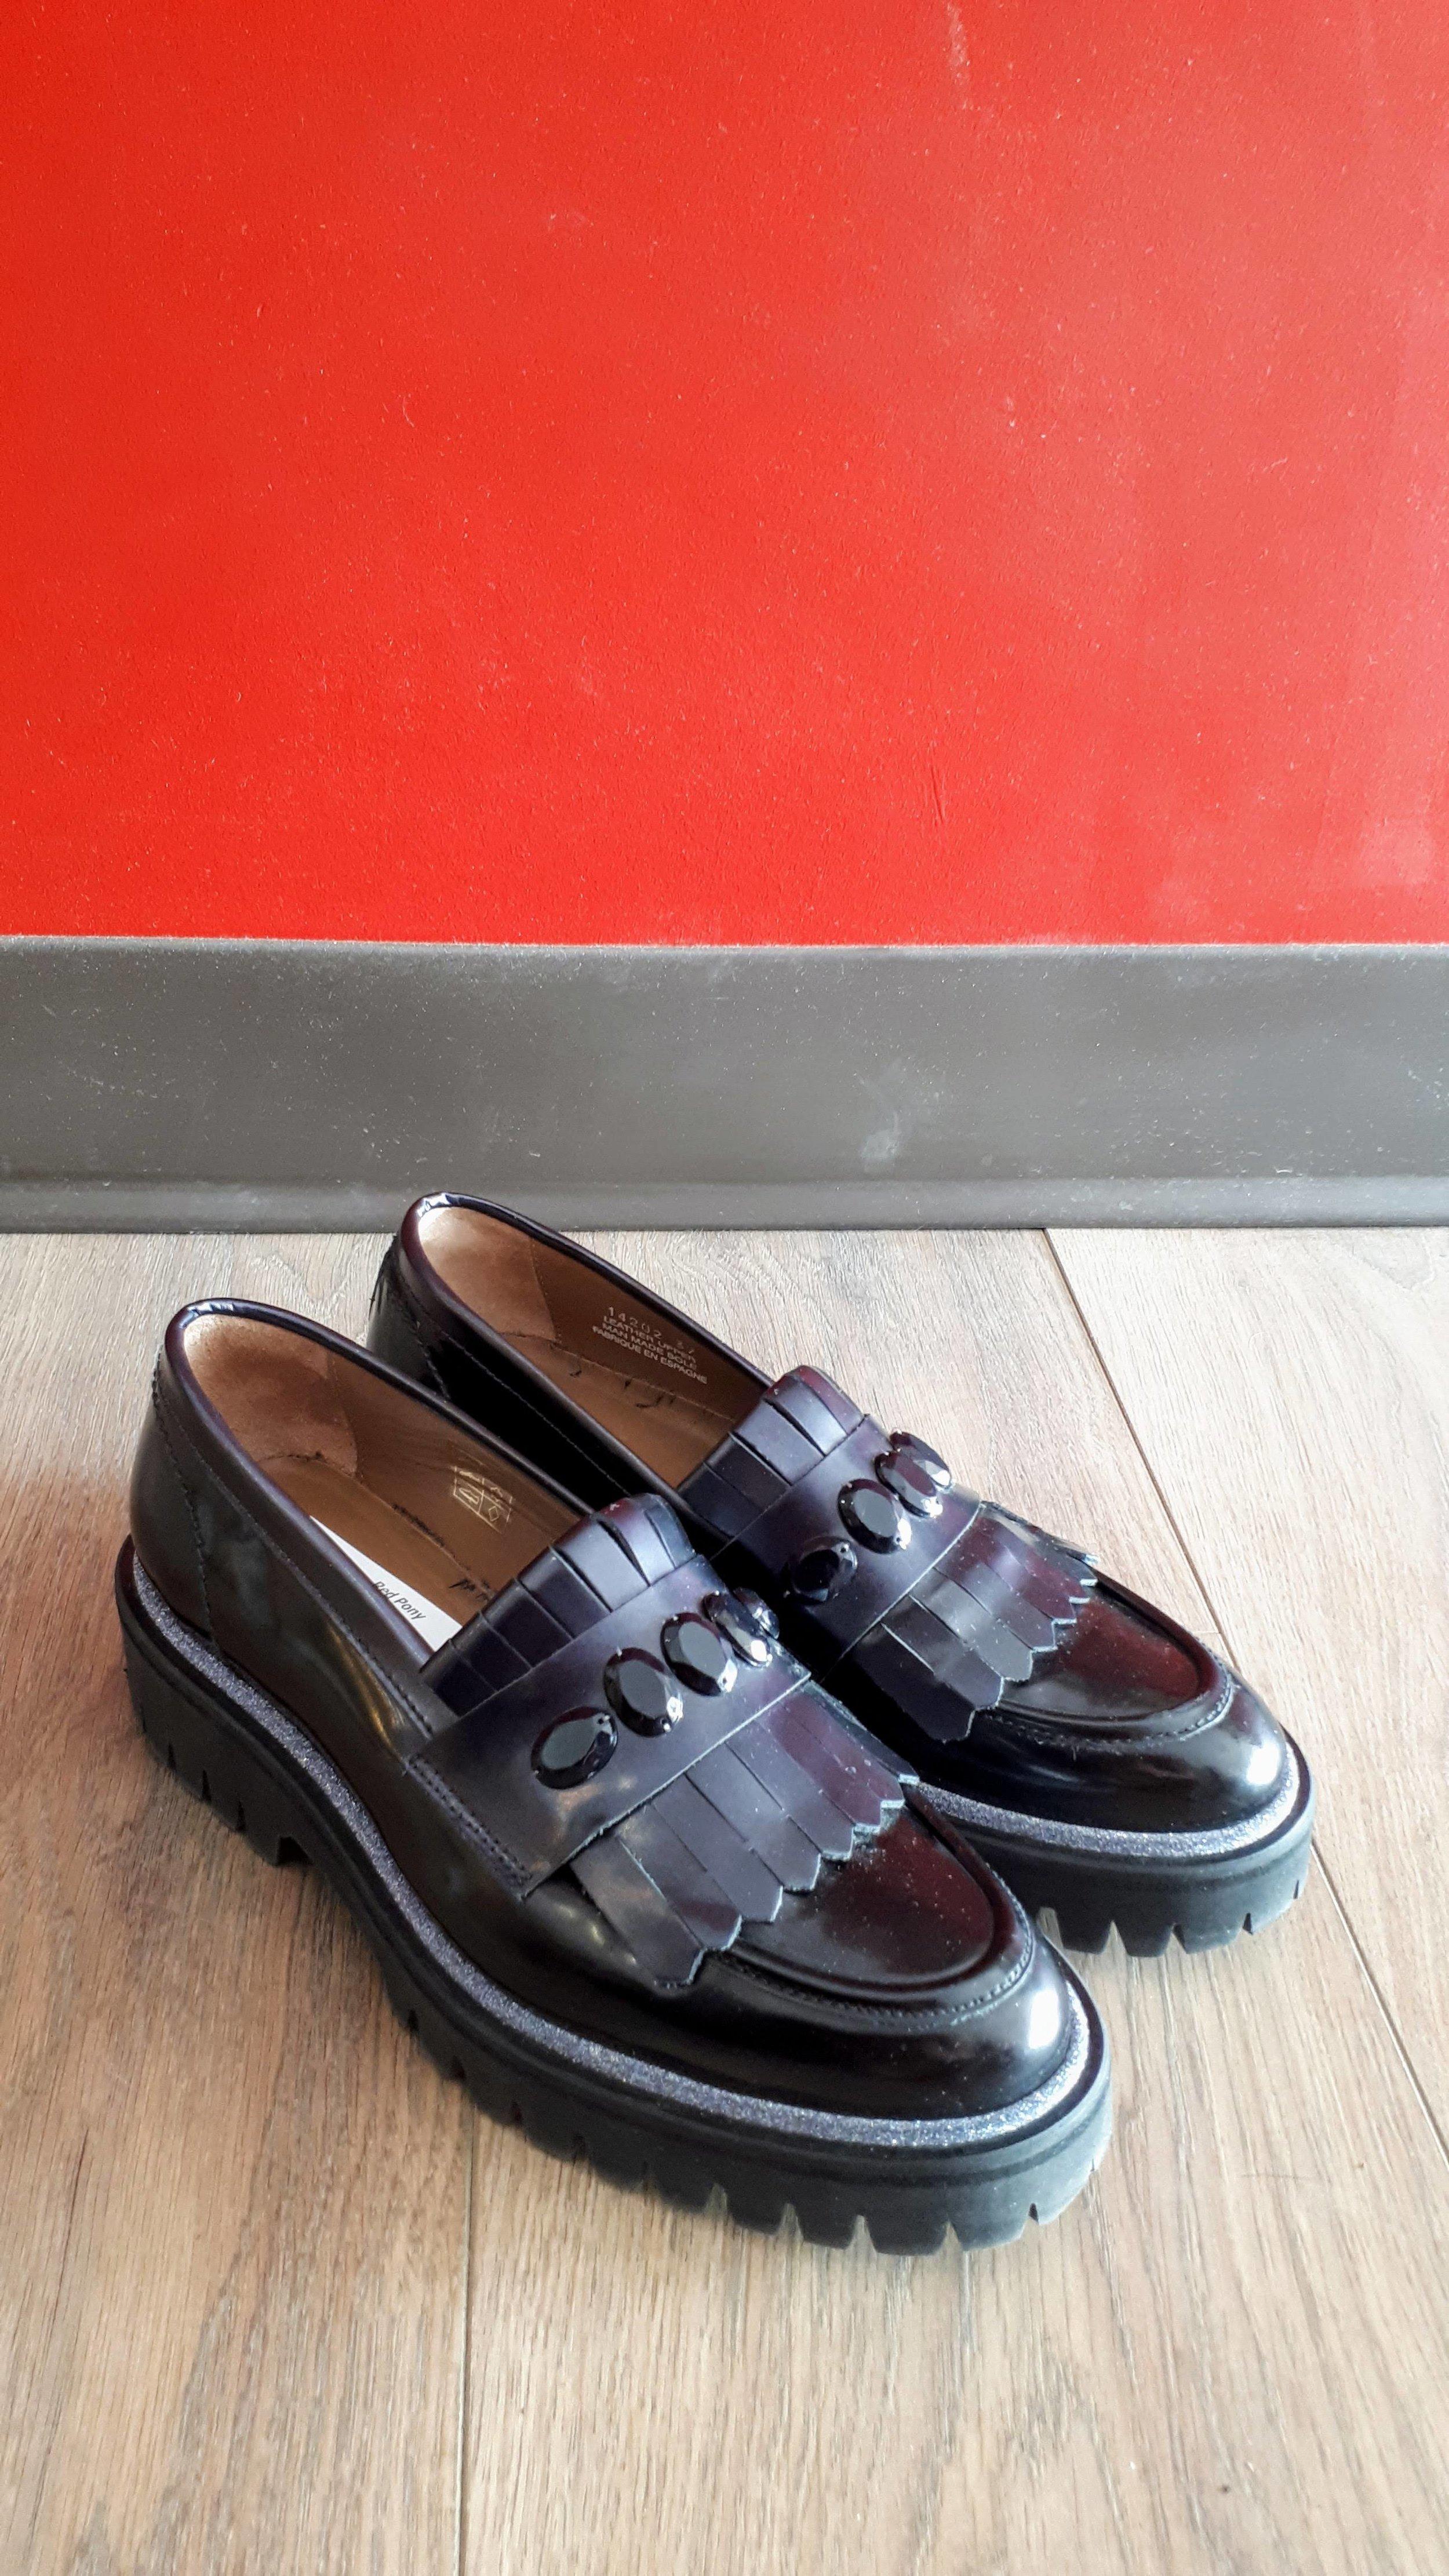 Pertini shoes; Size 7, $62